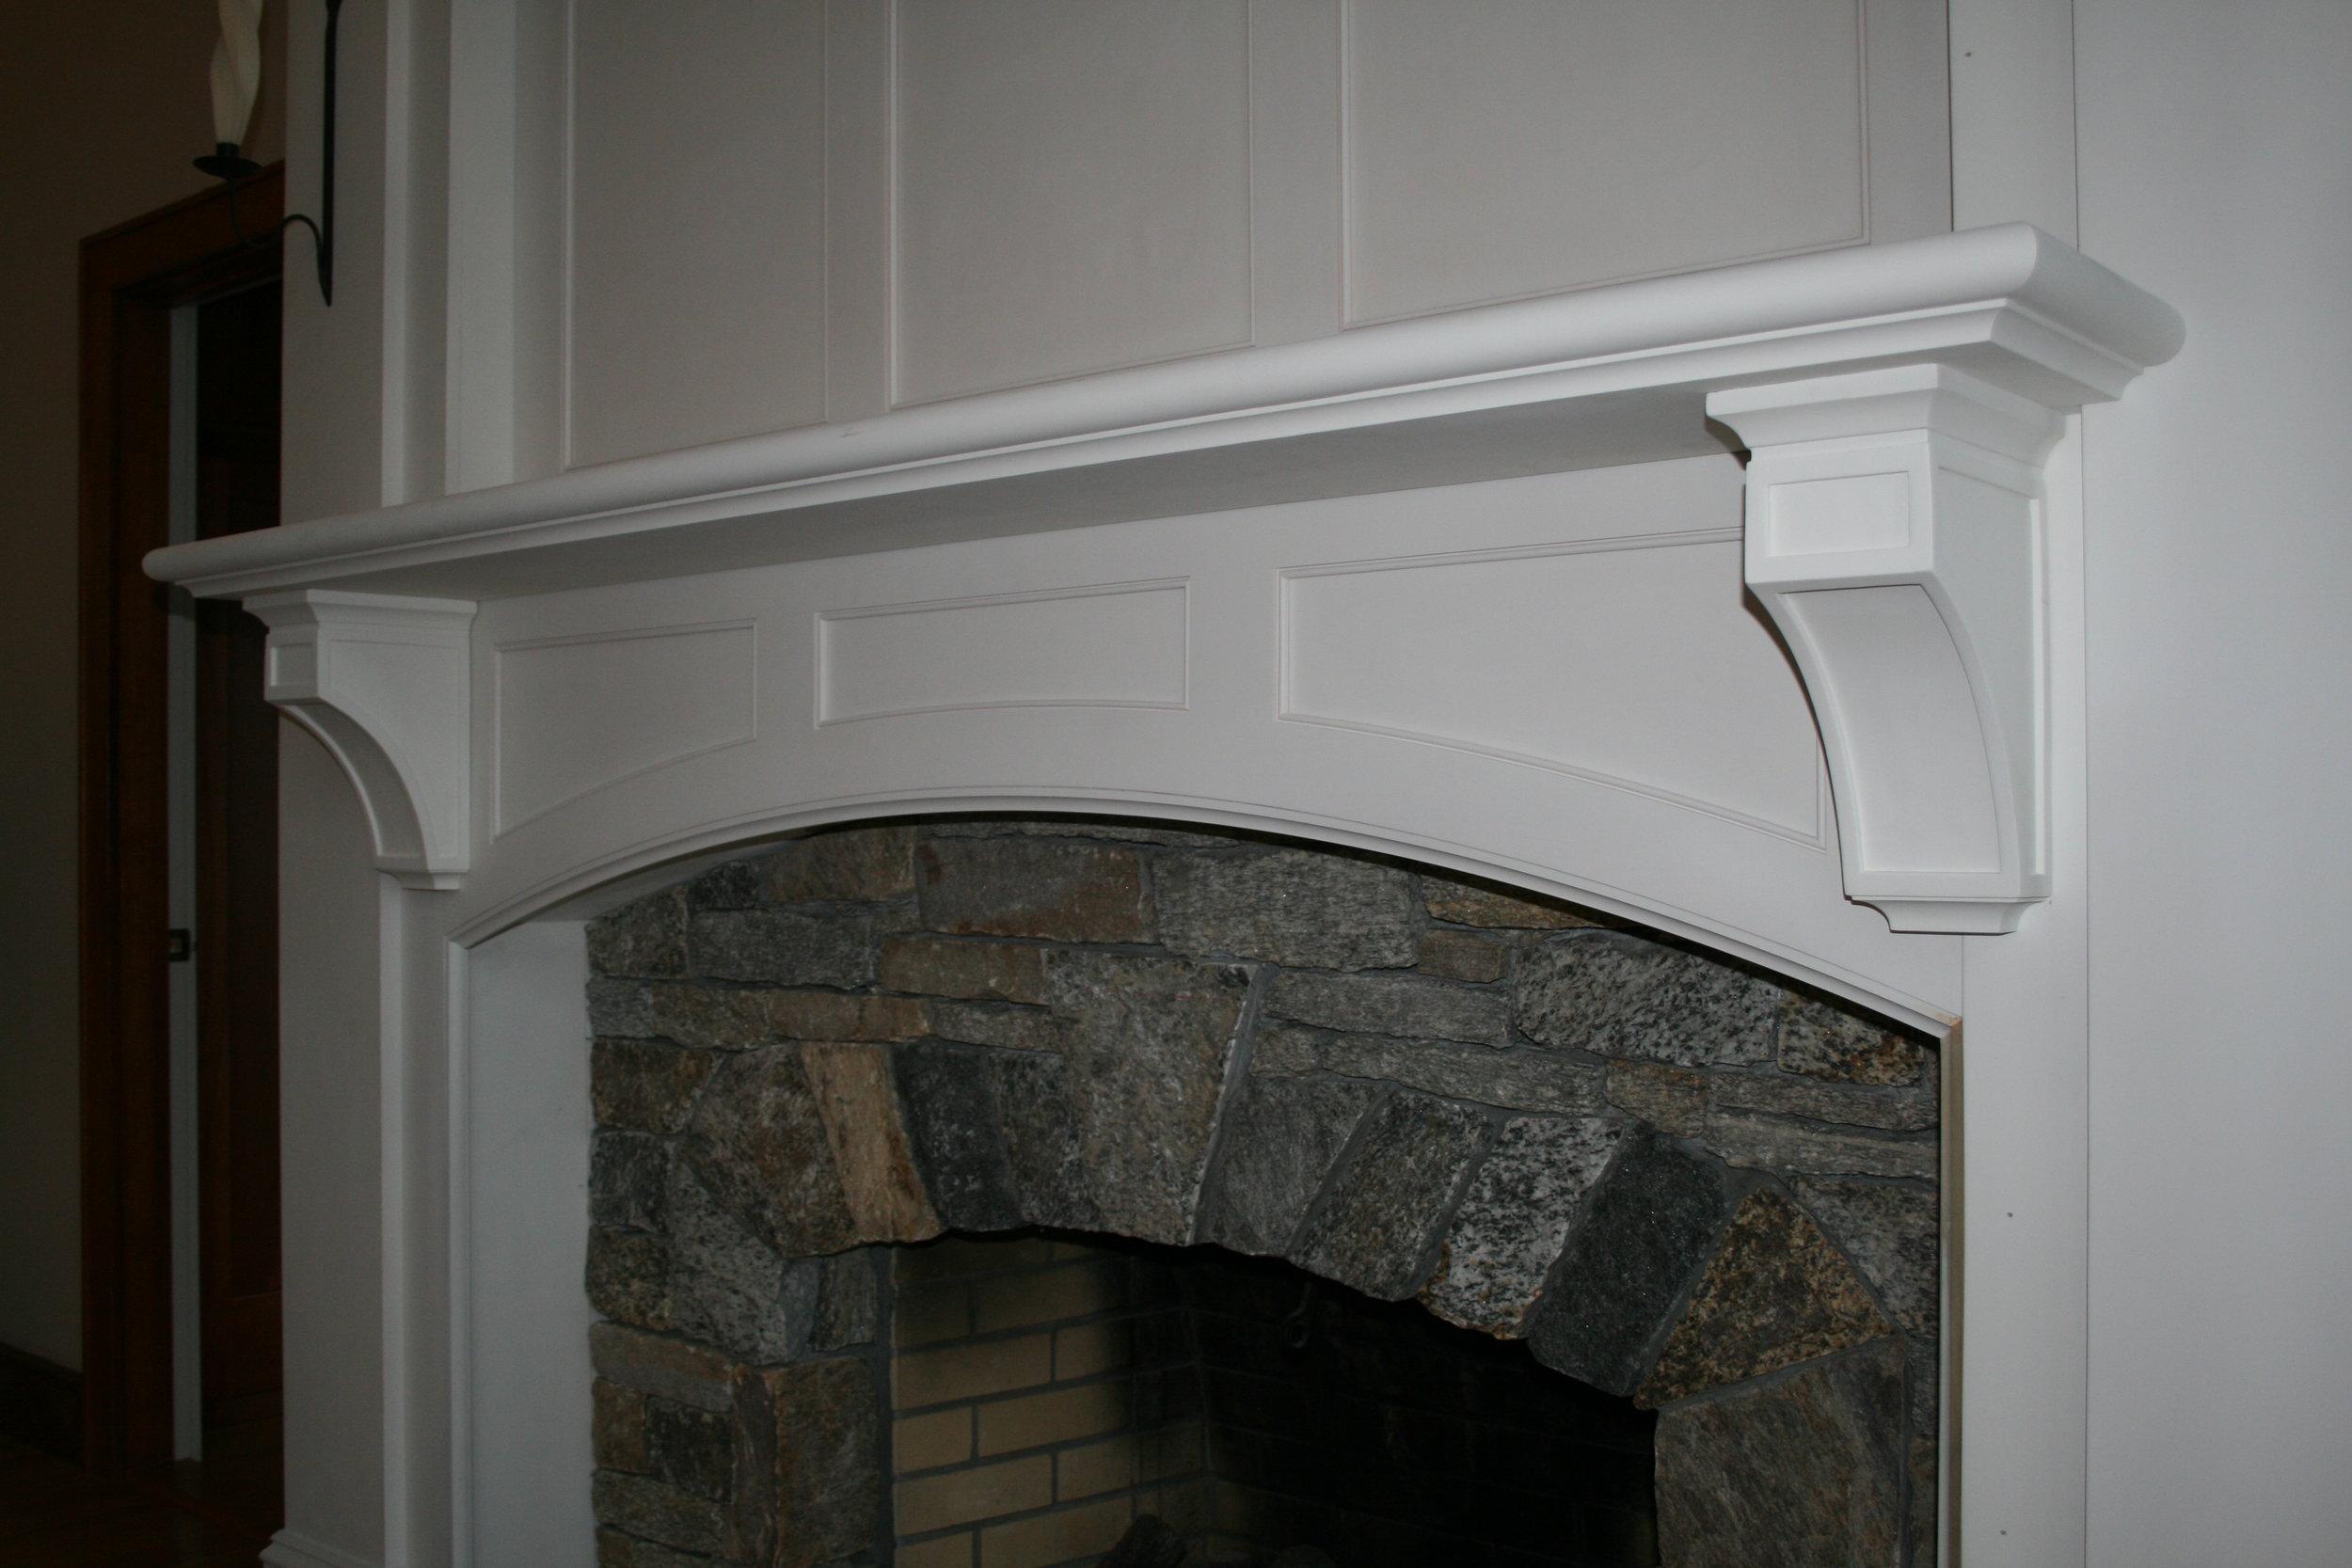 Fireplace Surround with Motorized Panel Lift 8.jpg